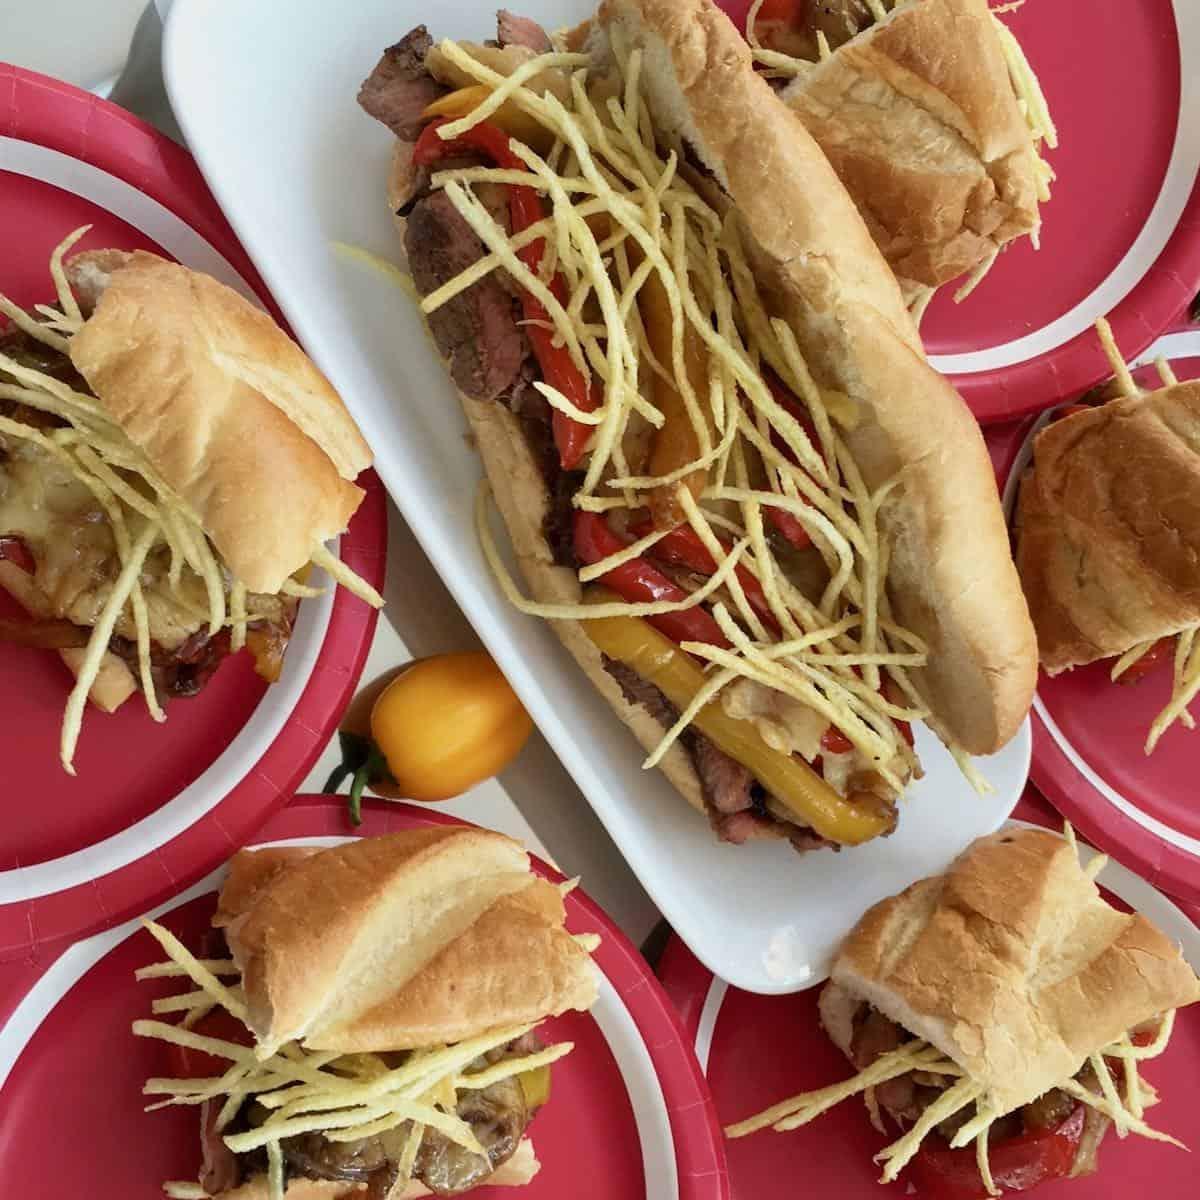 steak sandwiches with crispy potato strings